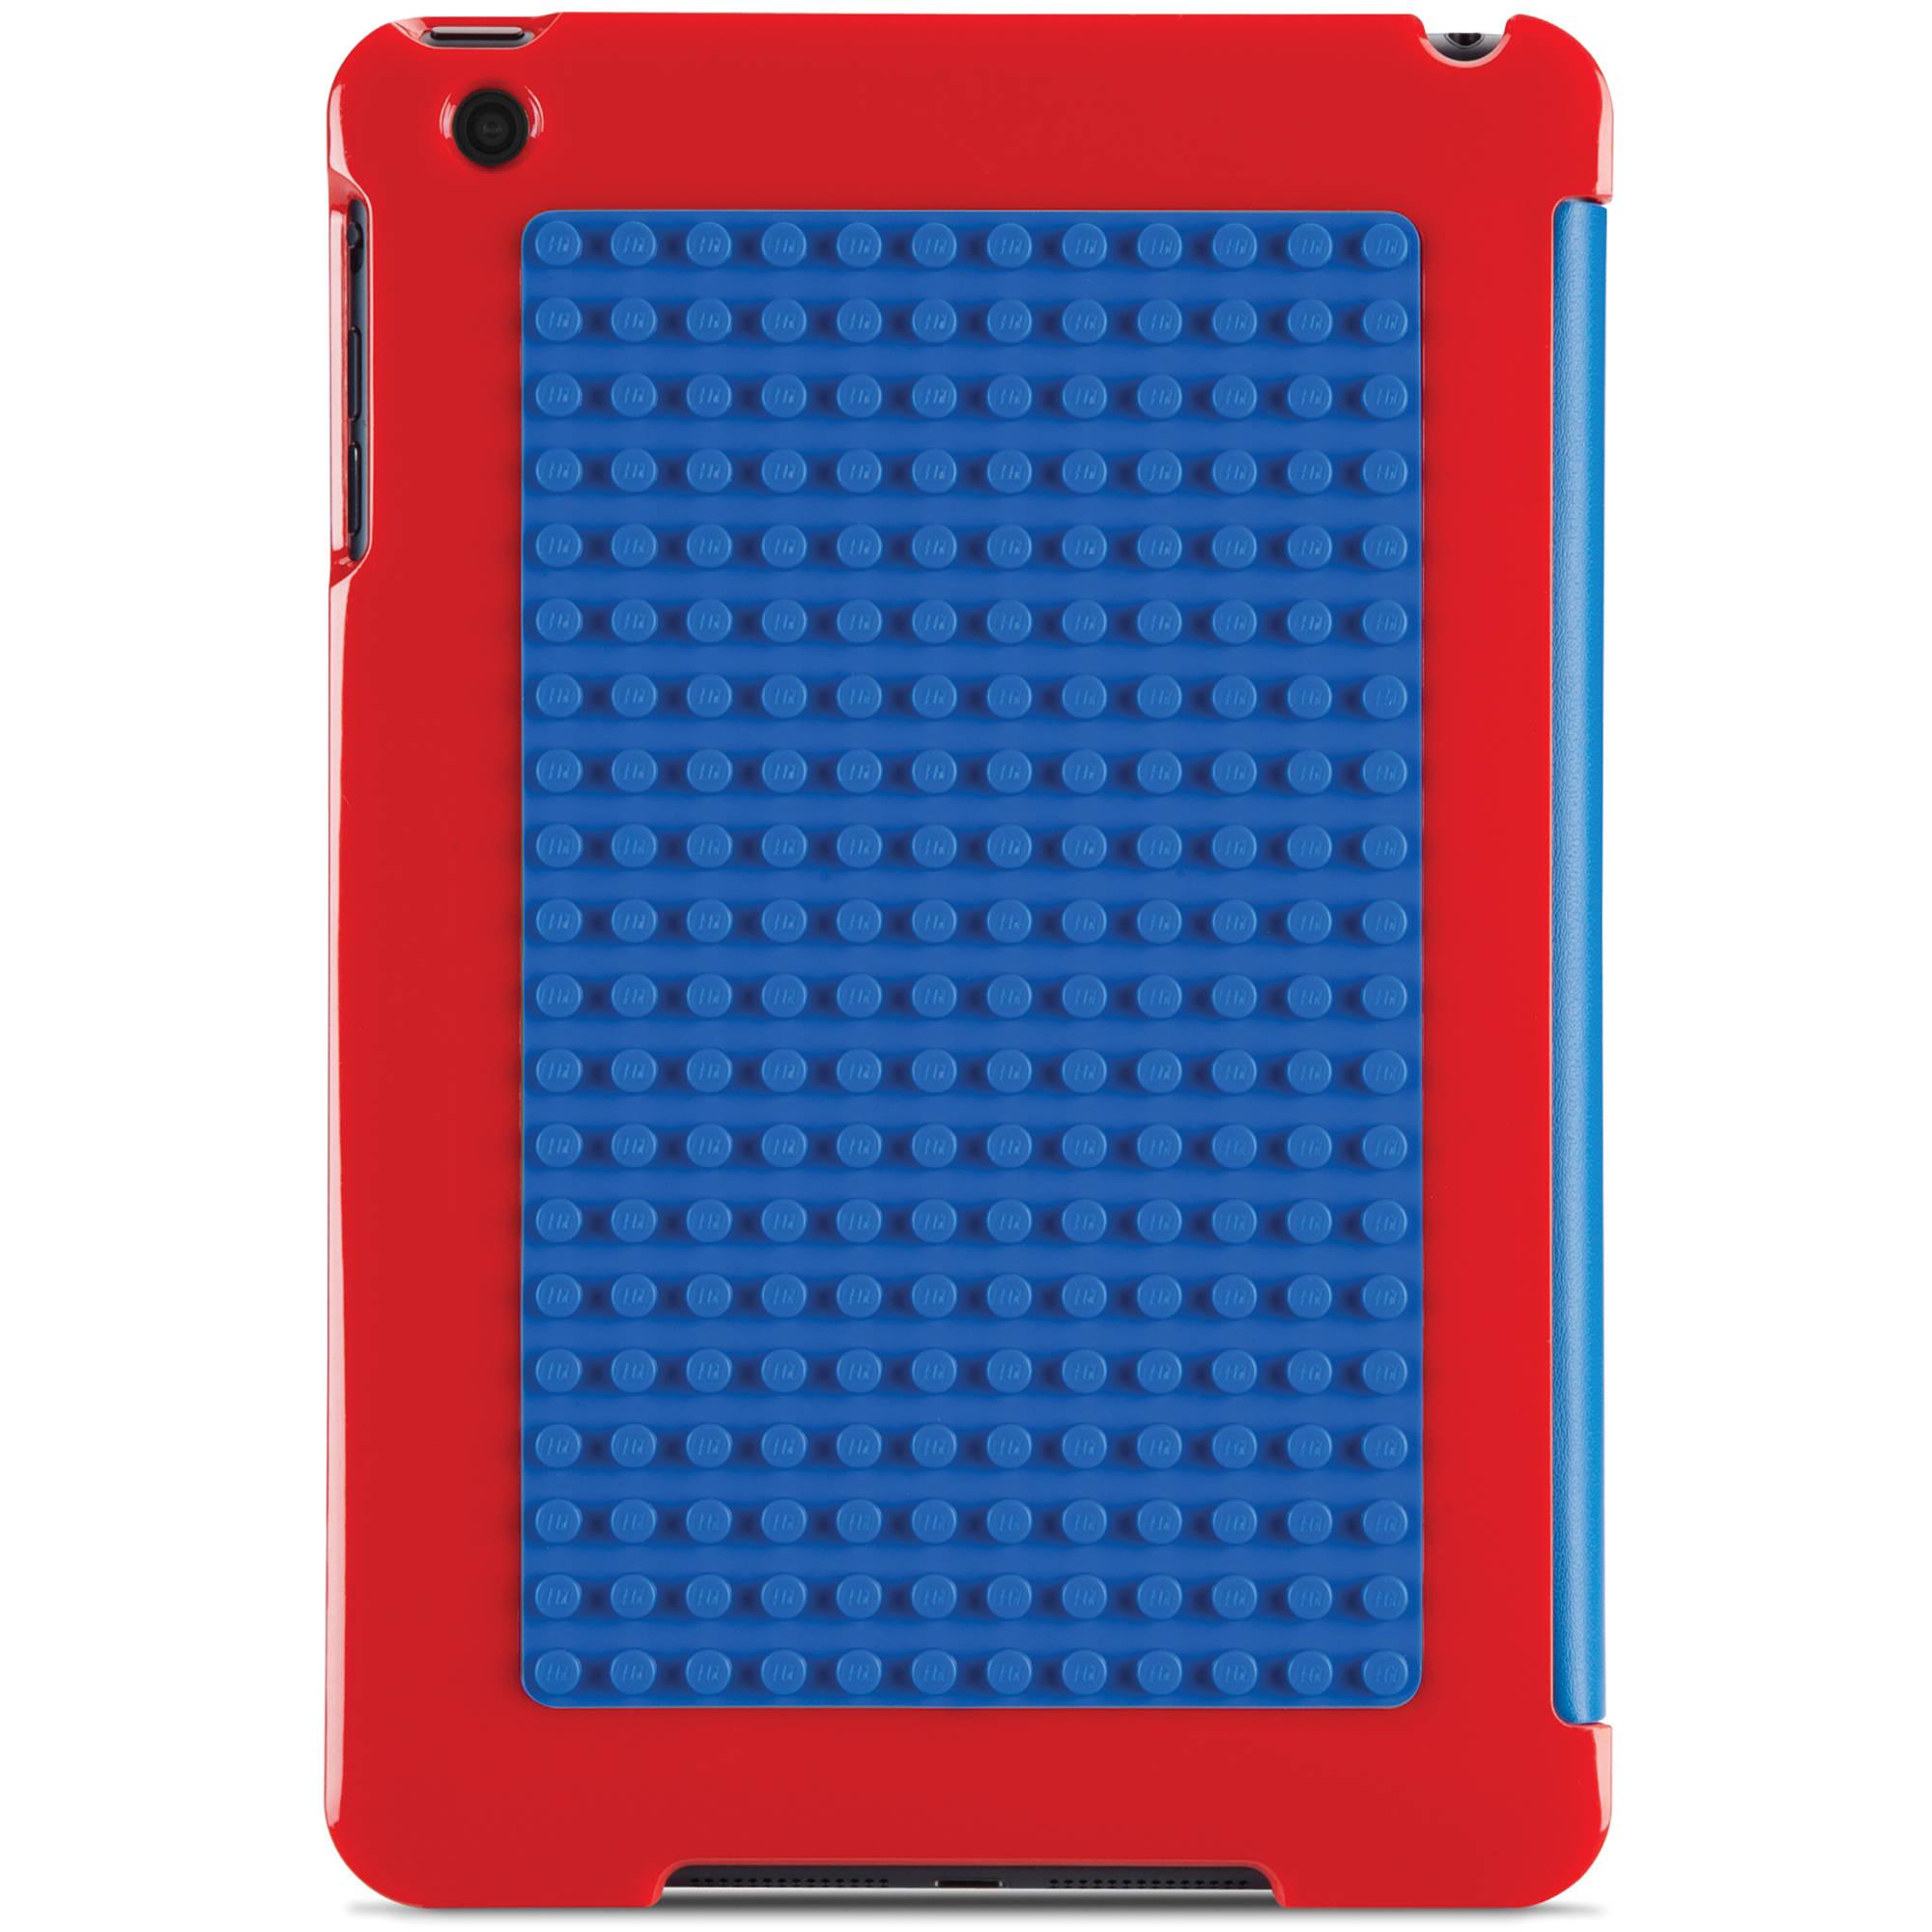 timeless design 01a88 74dd4 Belkin LEGO Builder Case for iPad mini (Red)